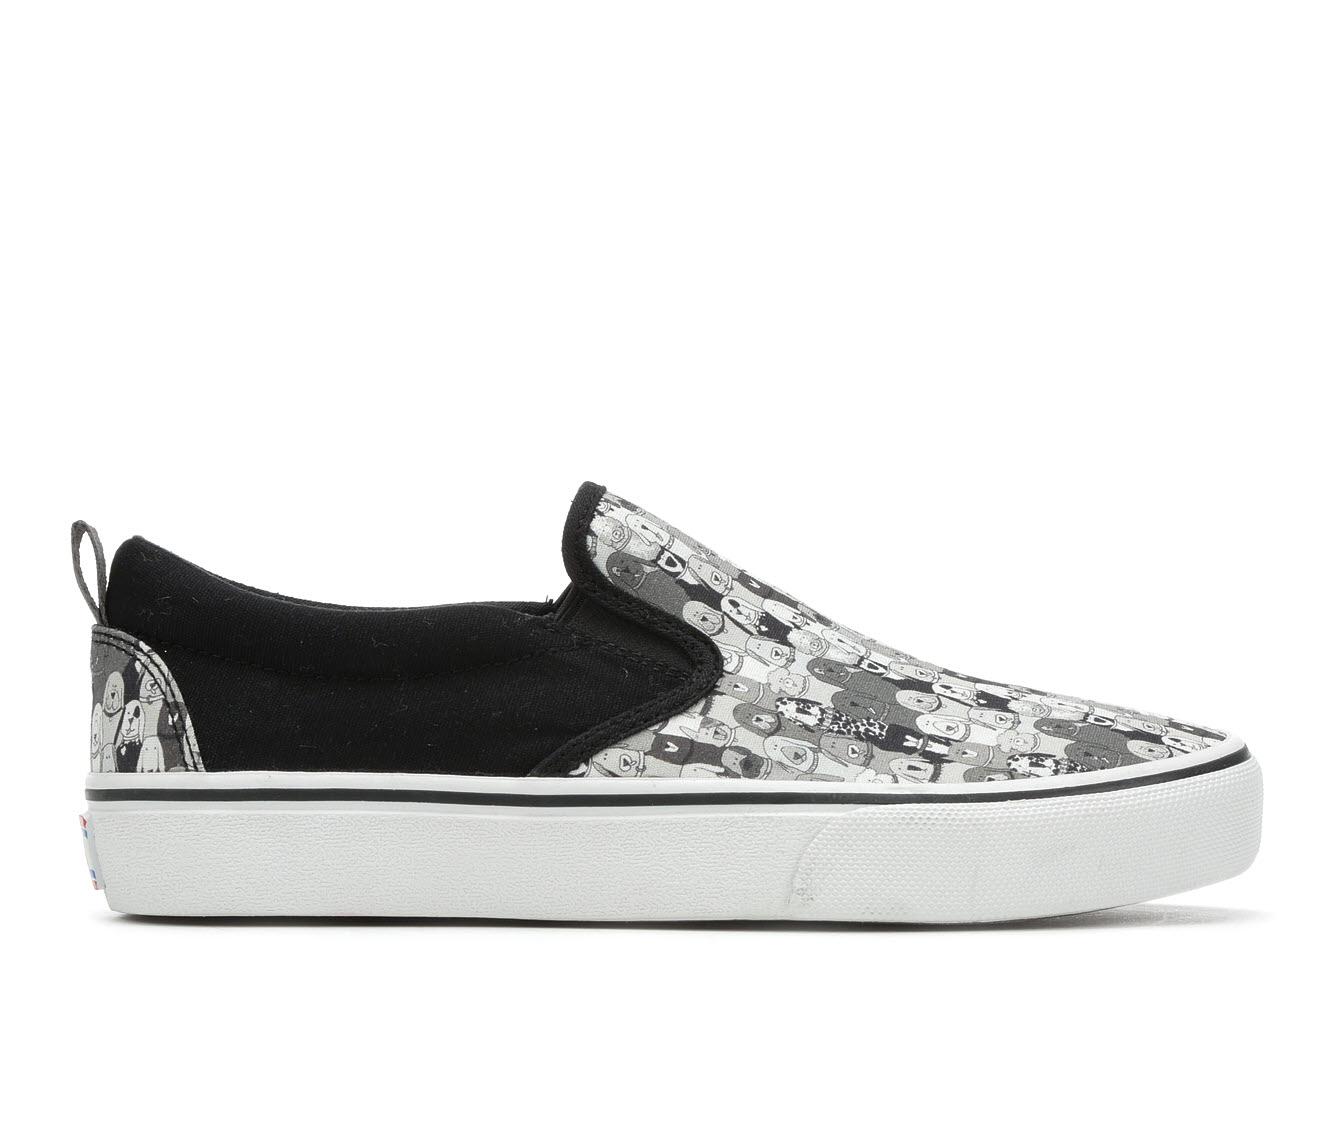 BOBS Marley Jr 33297 Women's Shoe (Black Canvas)